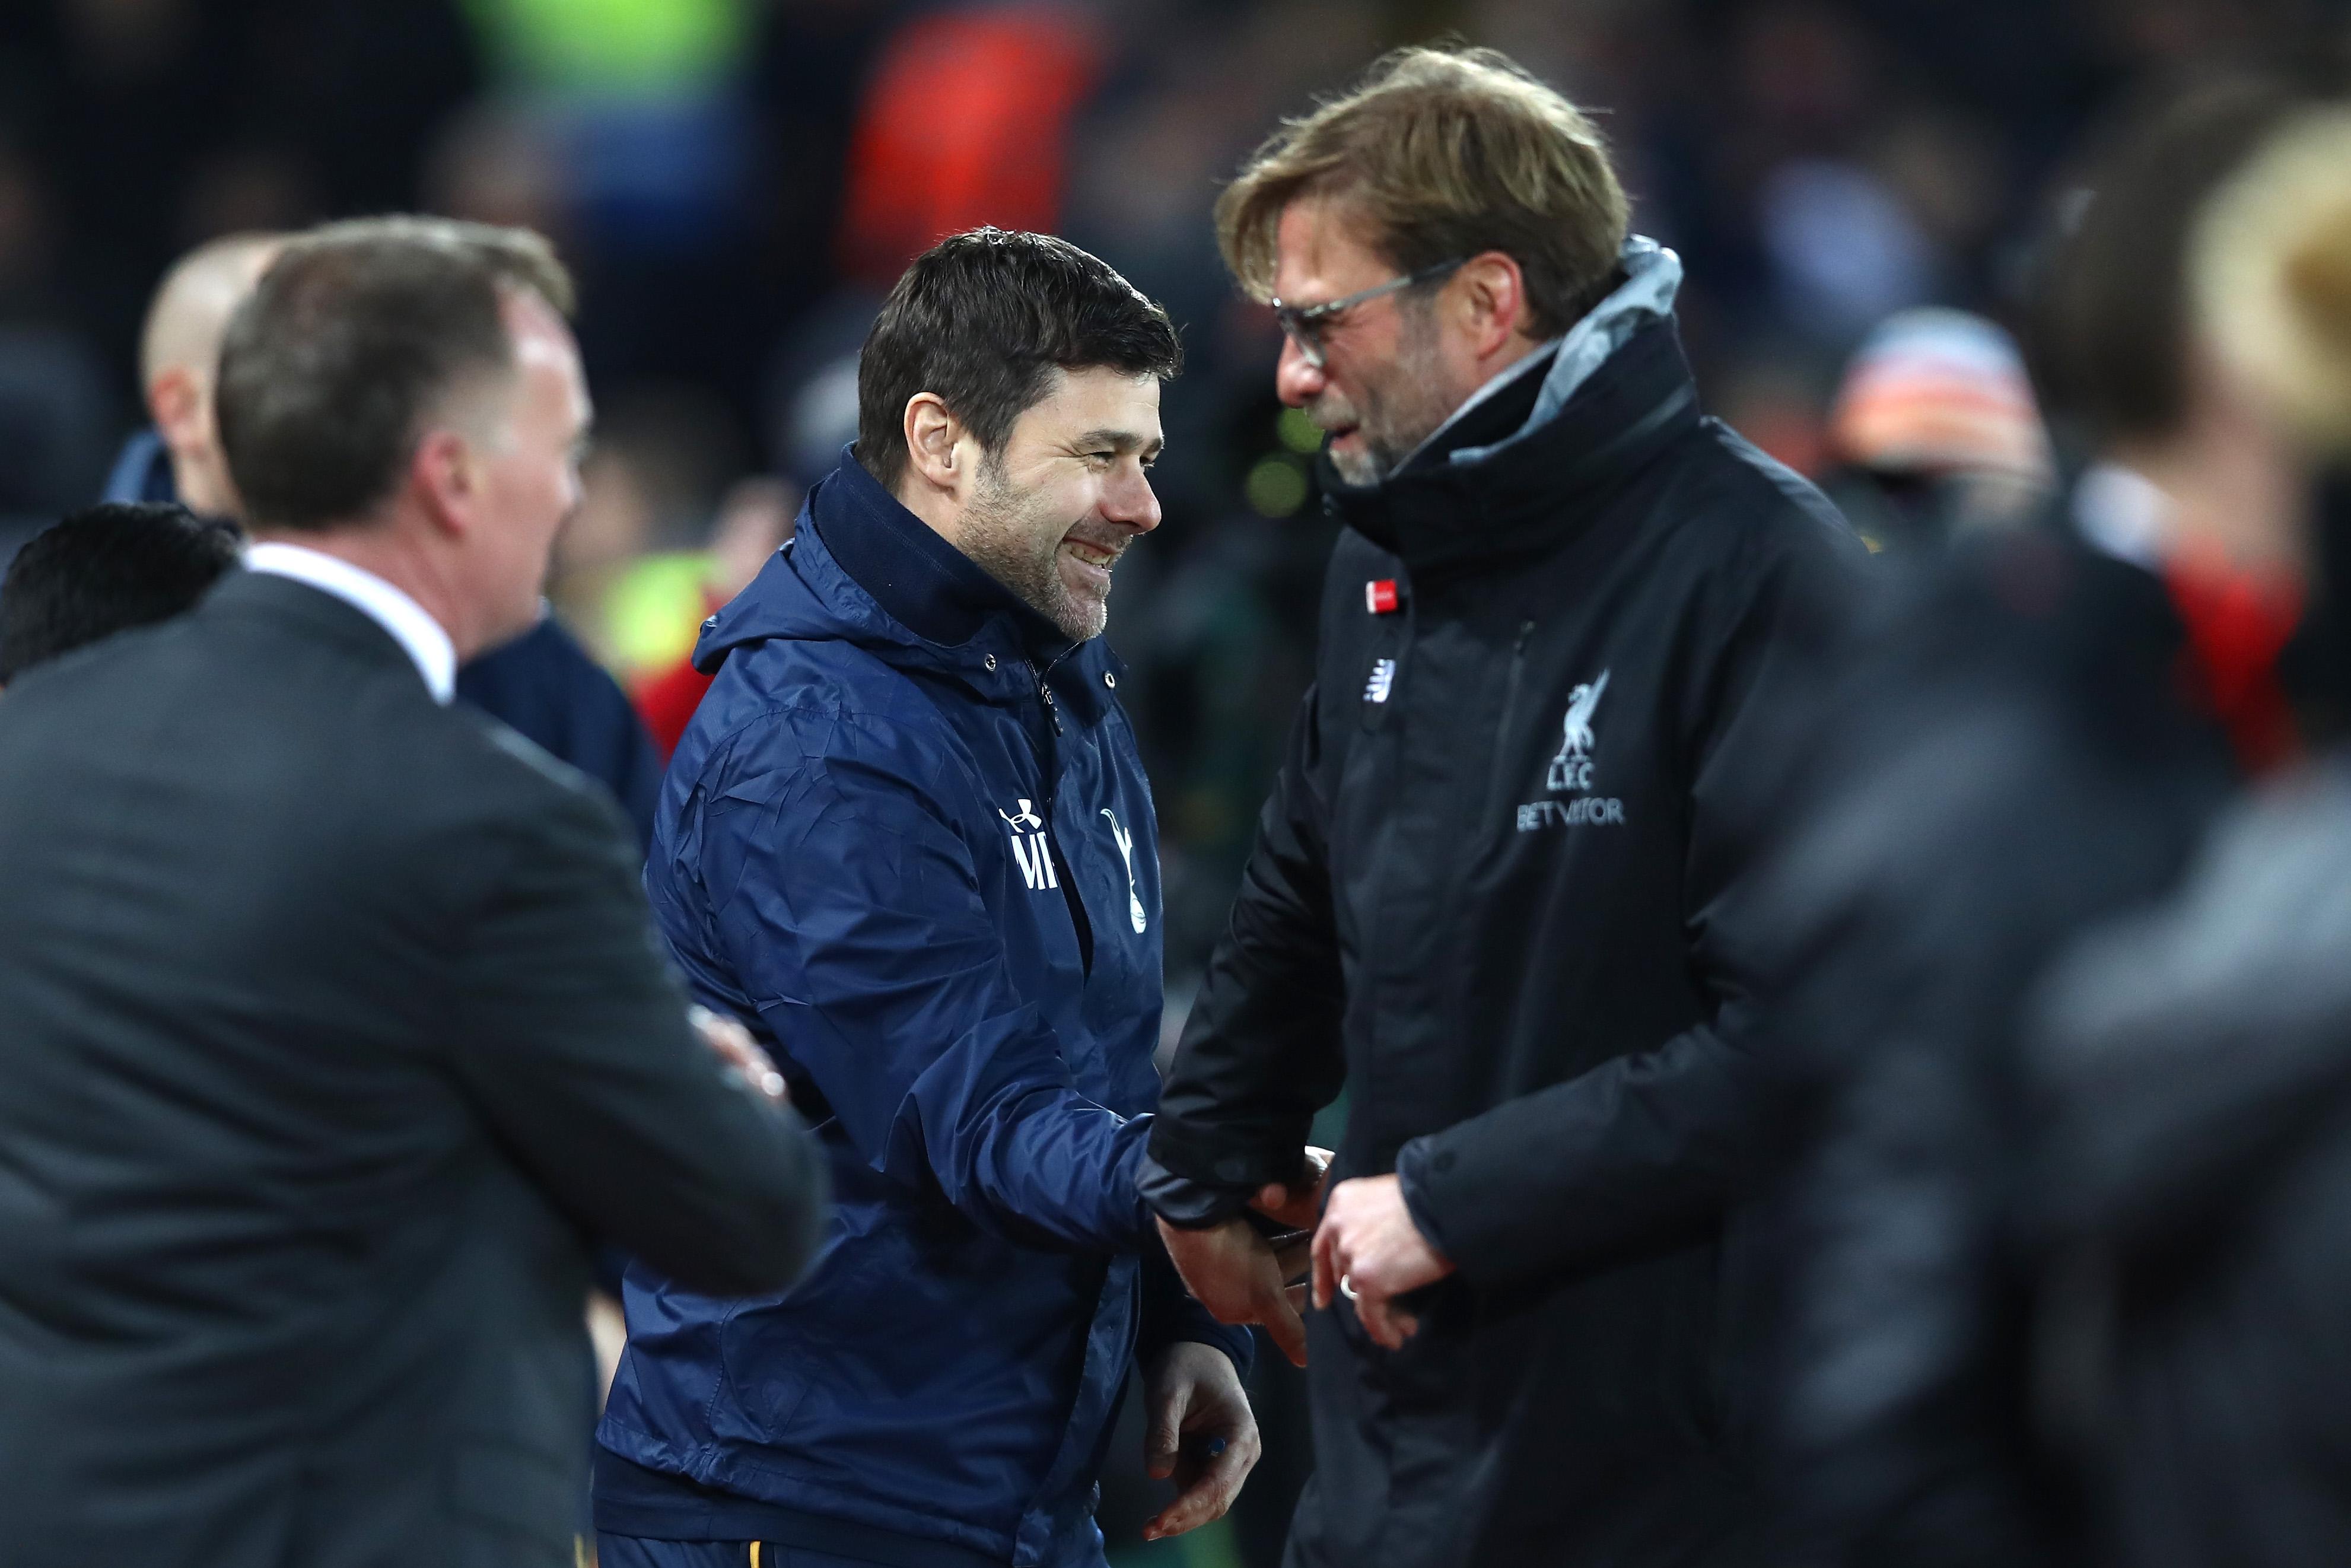 Liverpool Manager Klopp Declares Love For Spurs Man Harry Kane